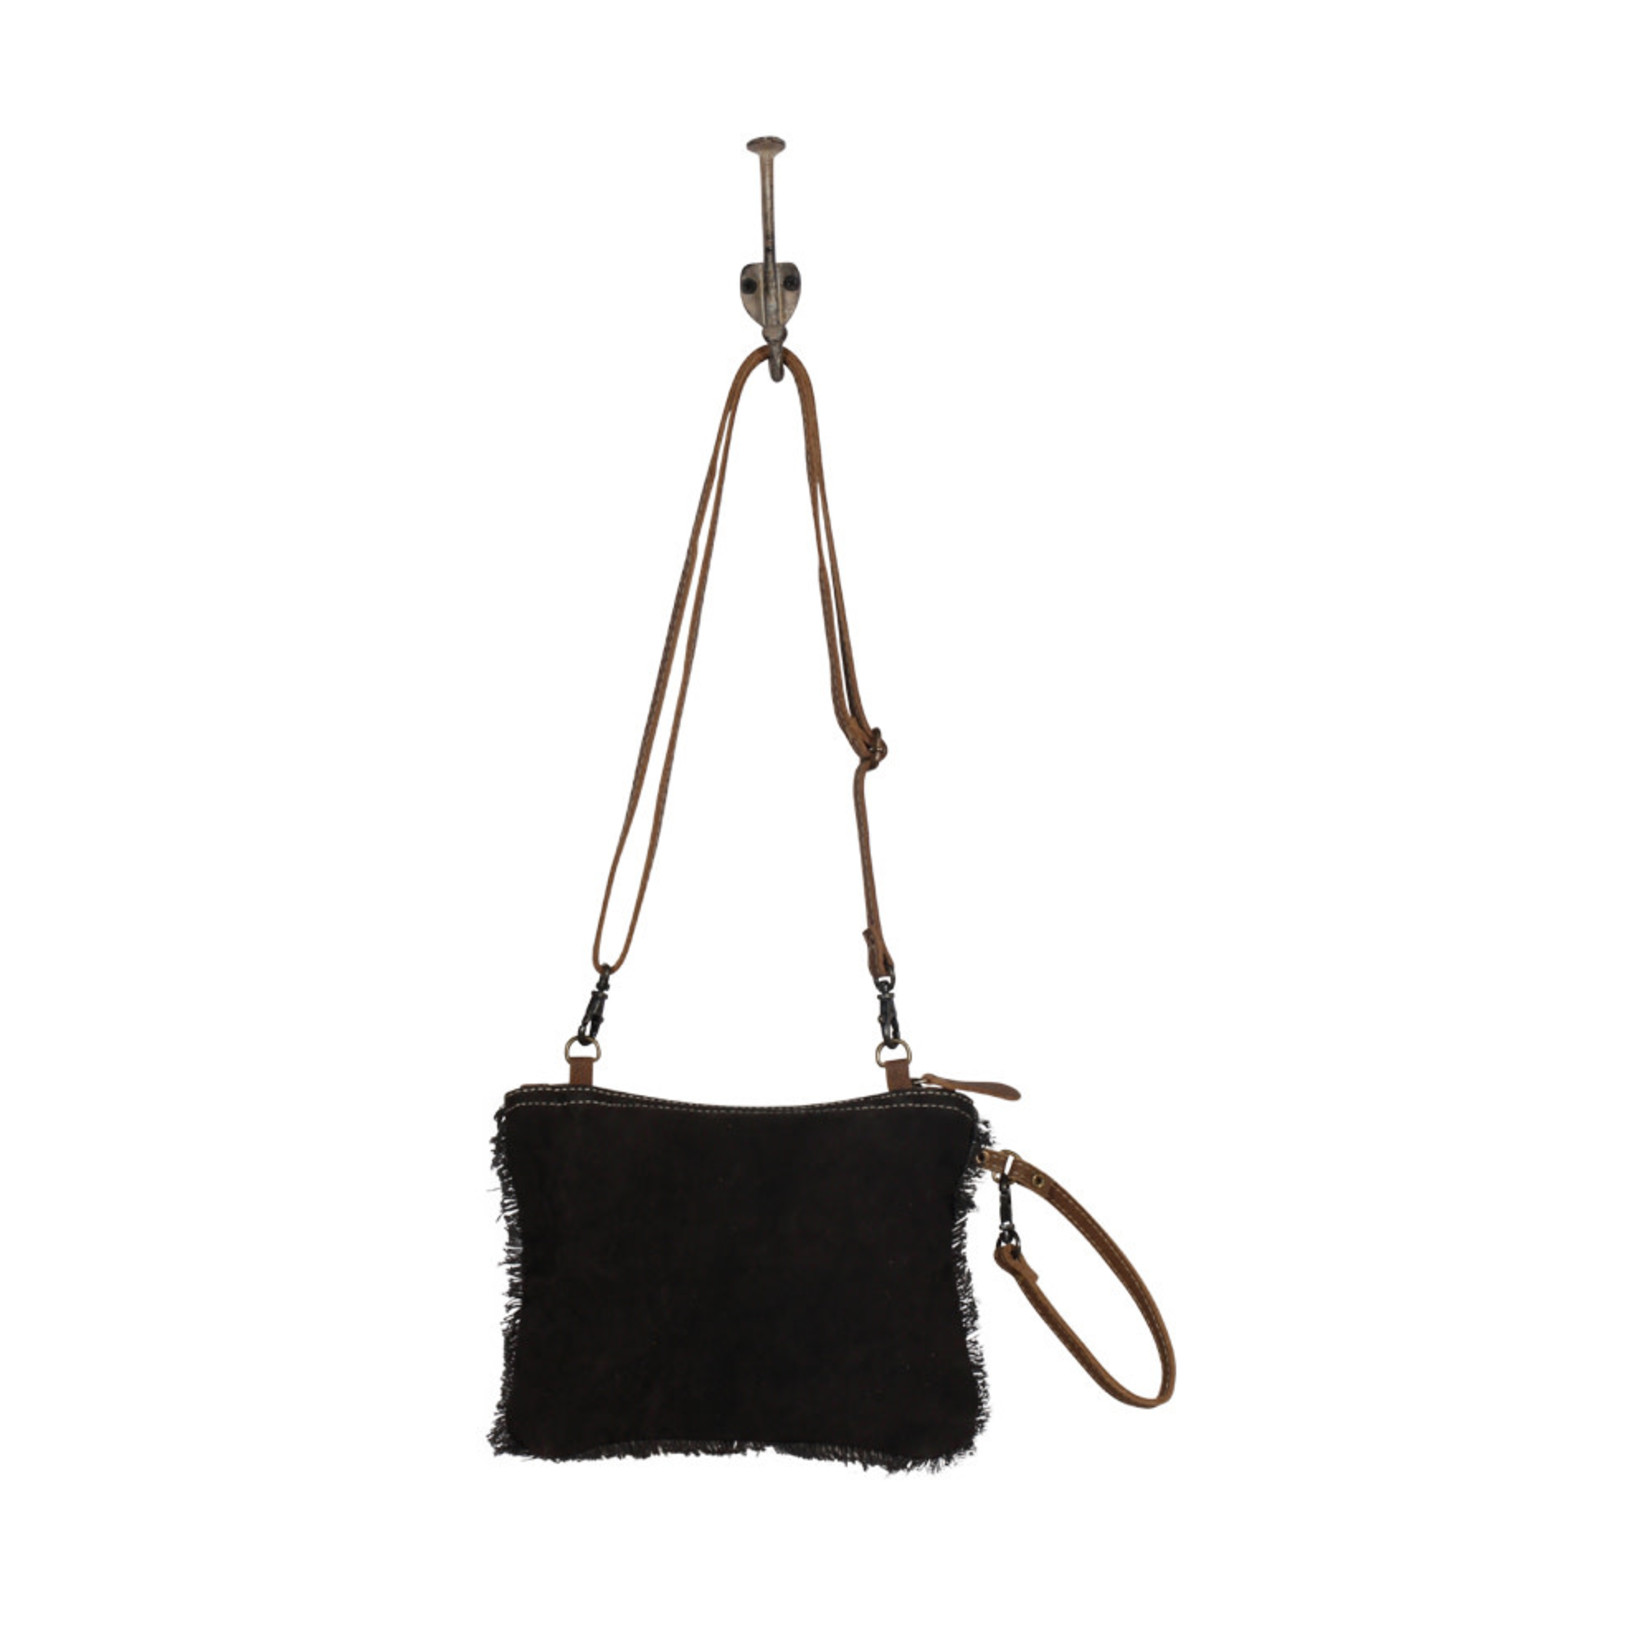 Myra Bags S-2028 Eccentric Small & Crossbody Bag